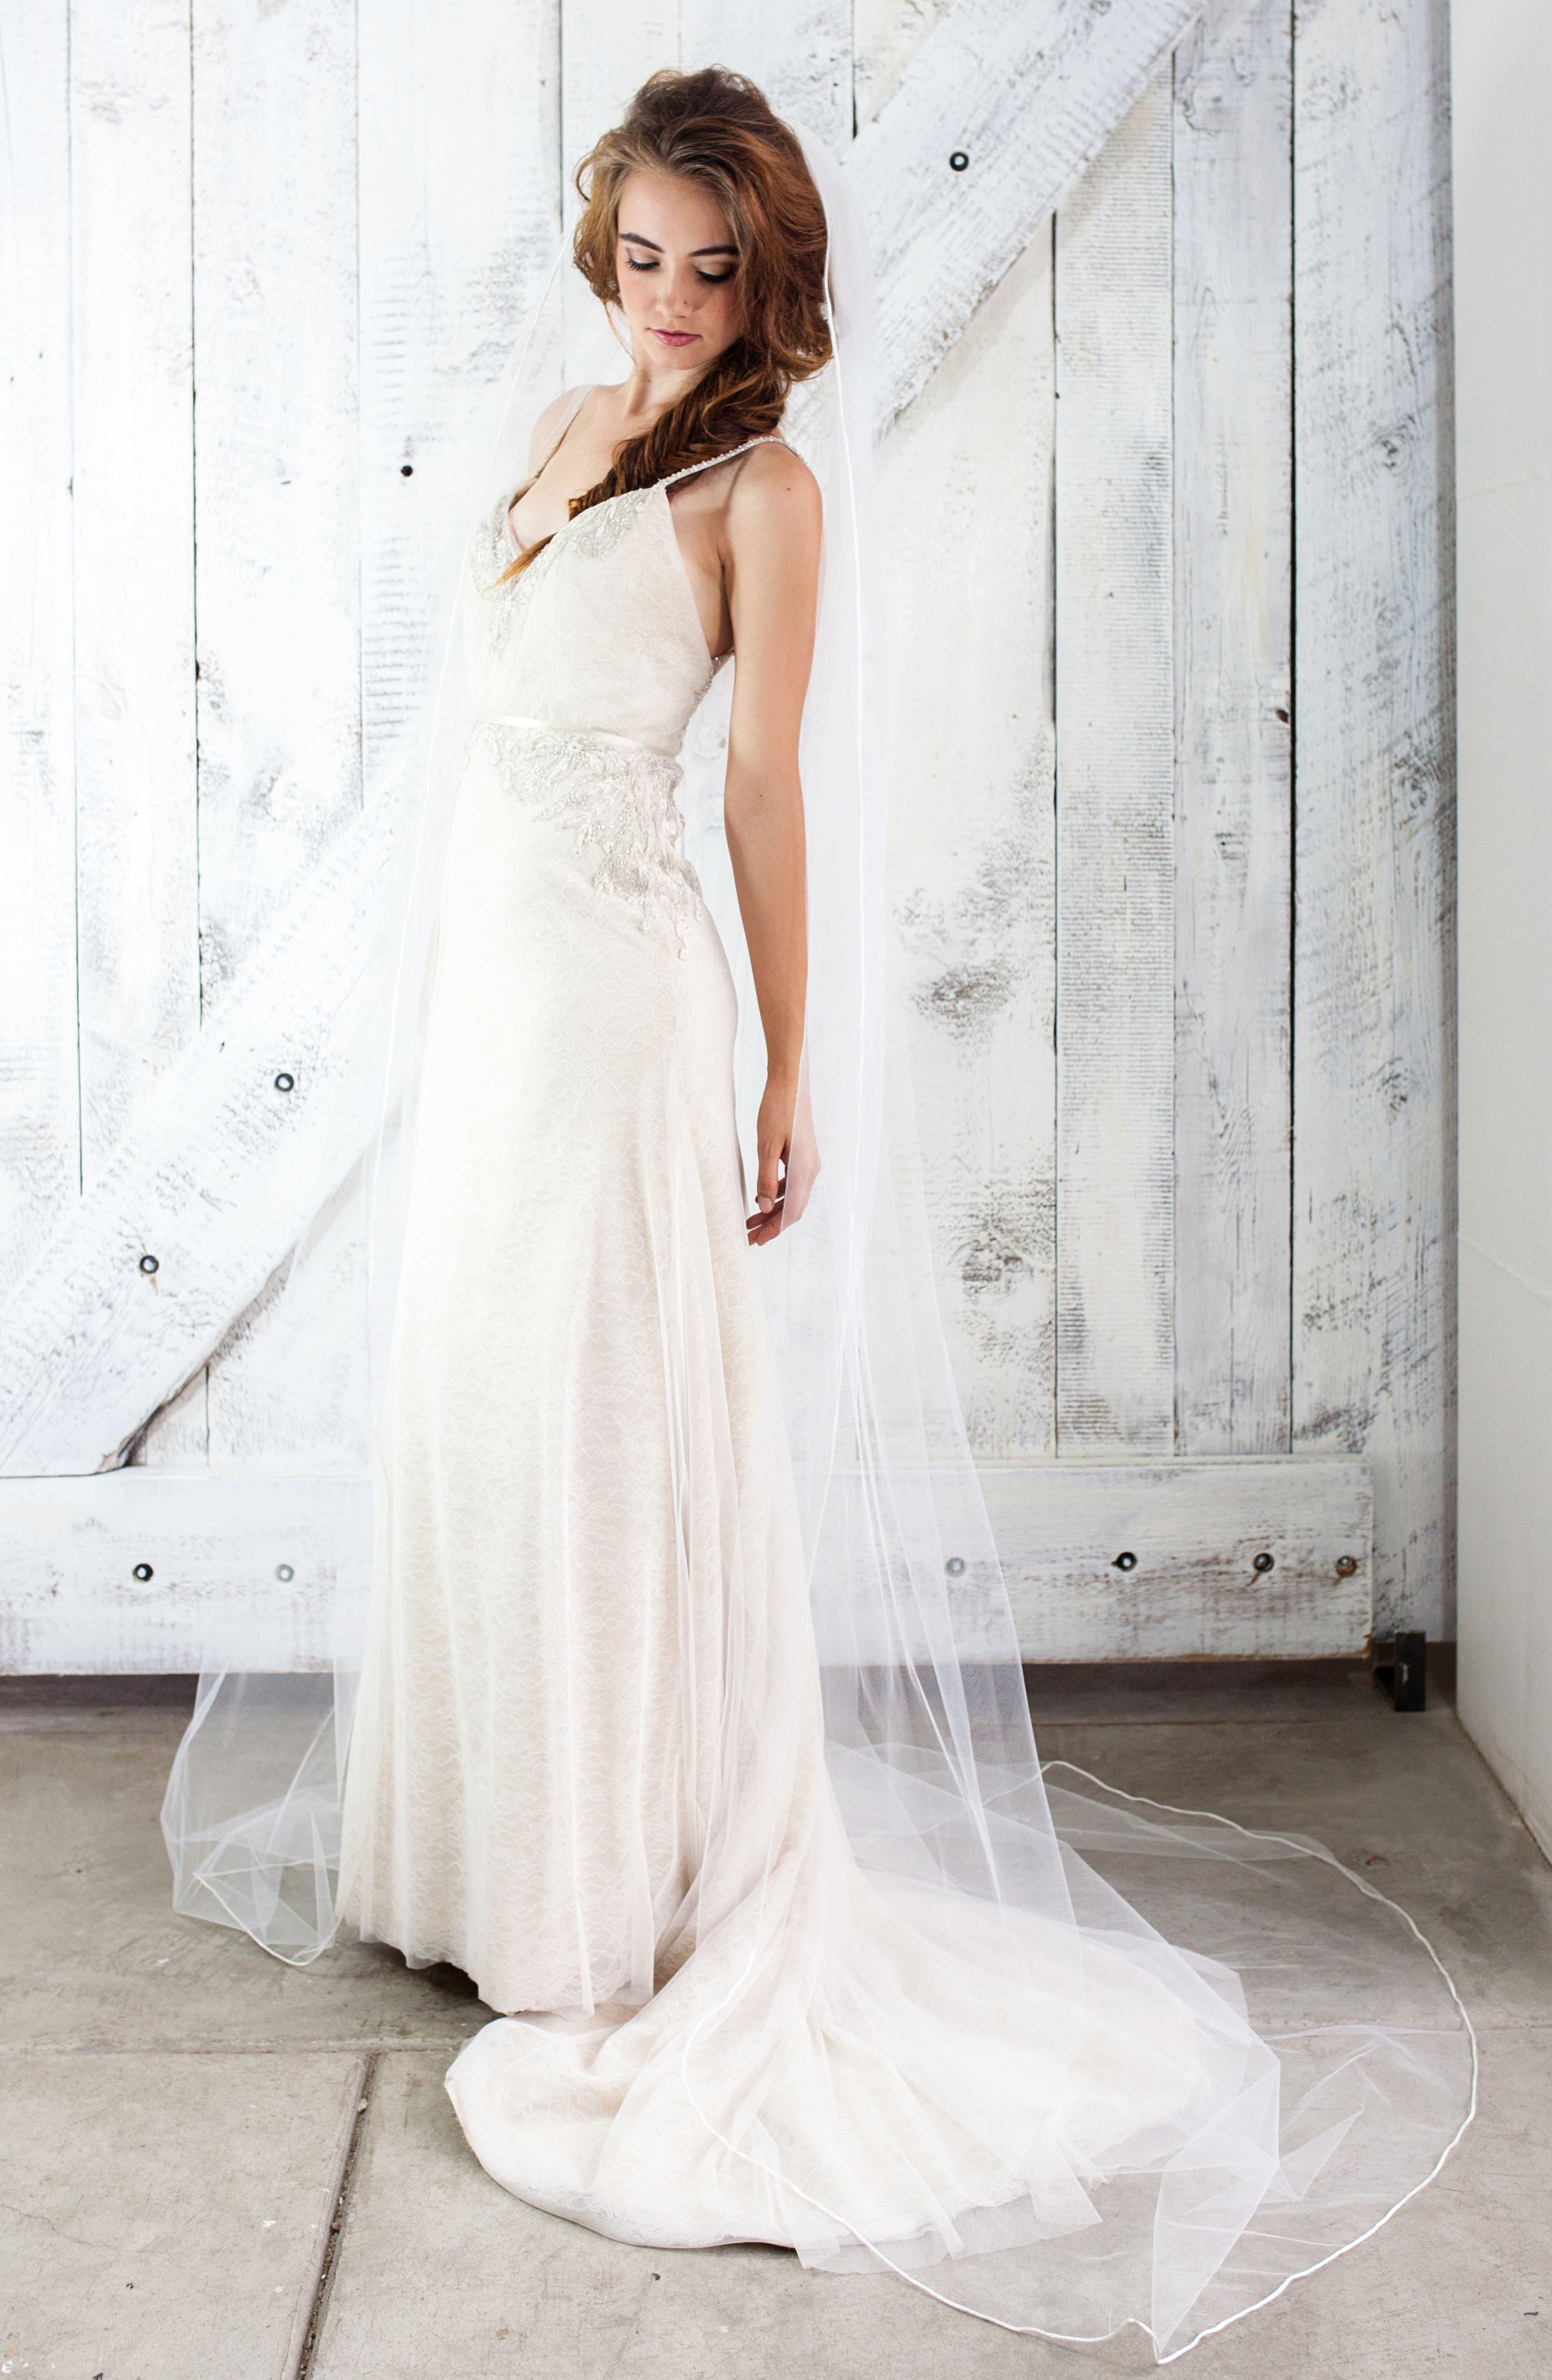 Kauai Mesh Bridal Veil,                         Main,                         color, 900